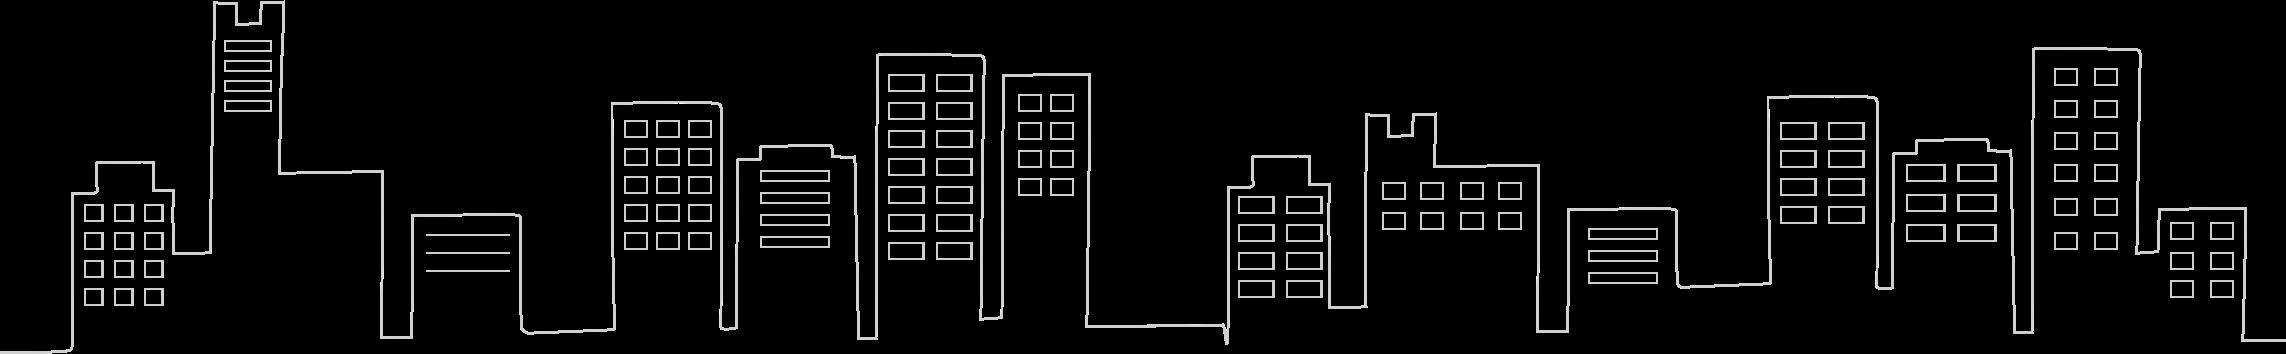 ilustracija - zgradbe, mesto